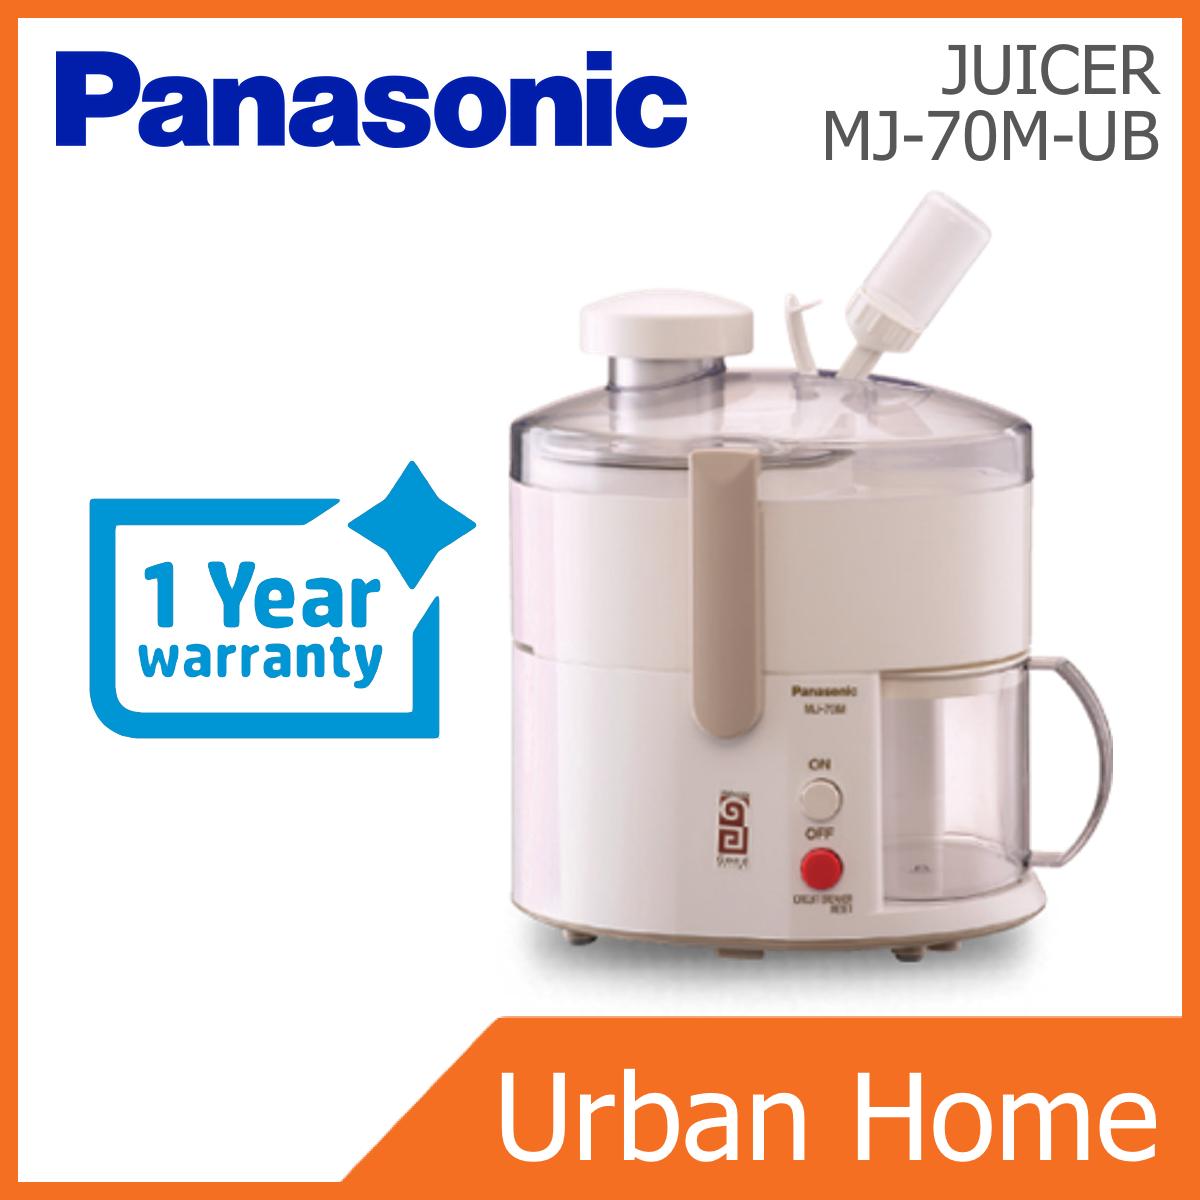 PANASONIC 200W Juicer (MJ-70M-UB/MJ-70M/MJ70MUB/MJ70M)